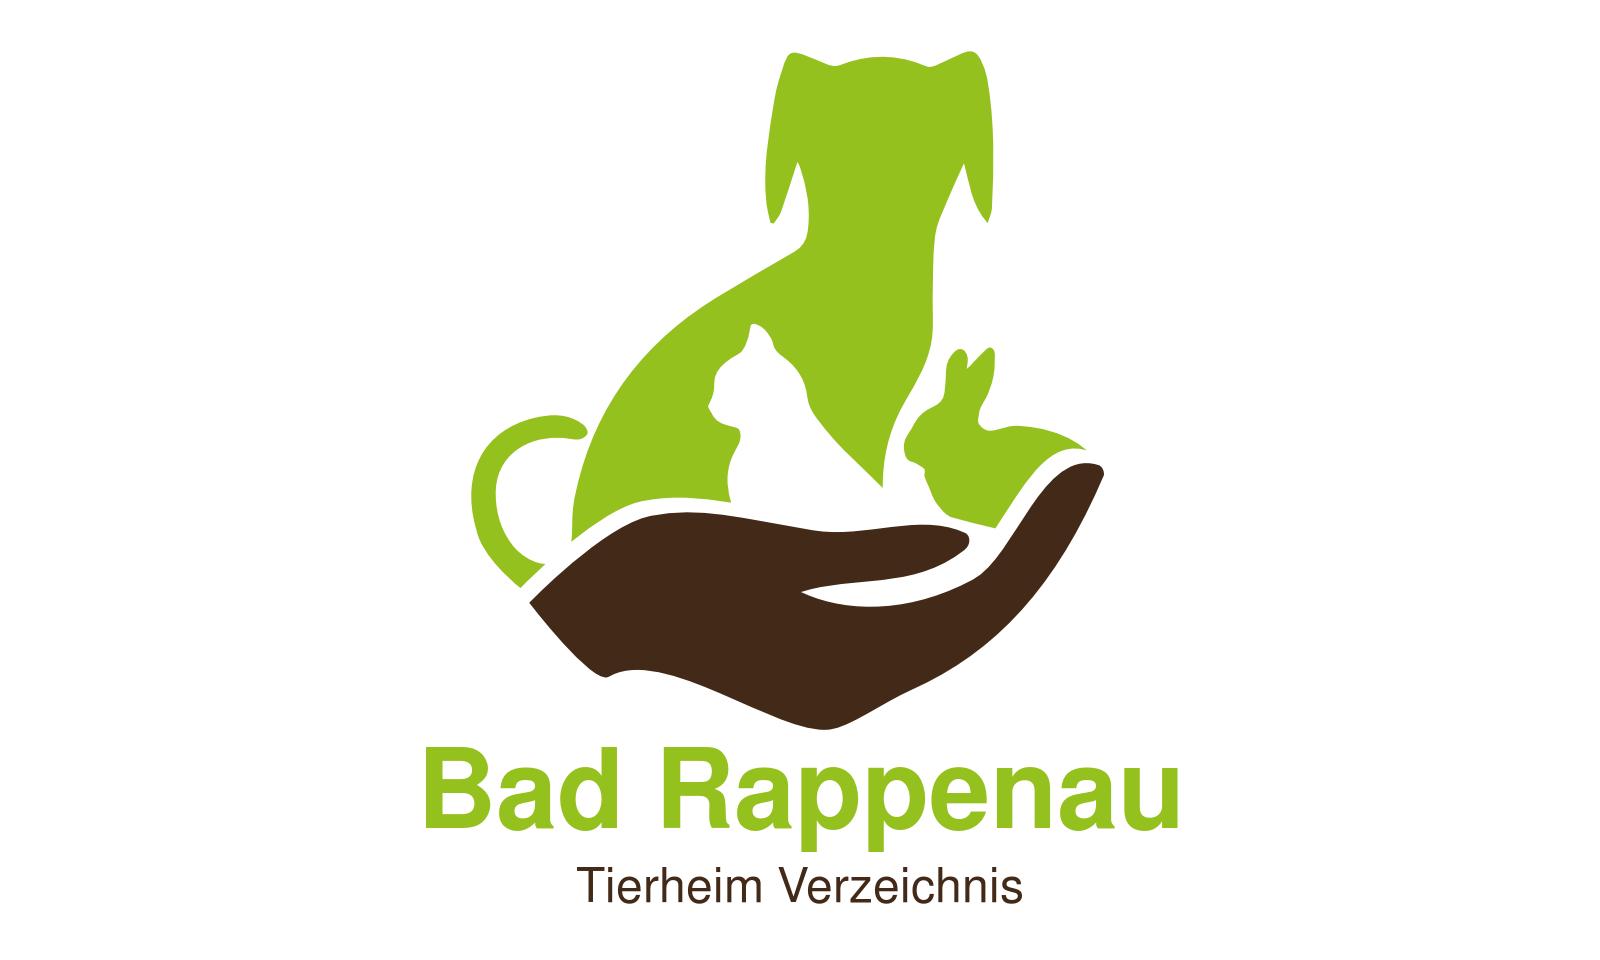 Tierheim Bad Rappenau